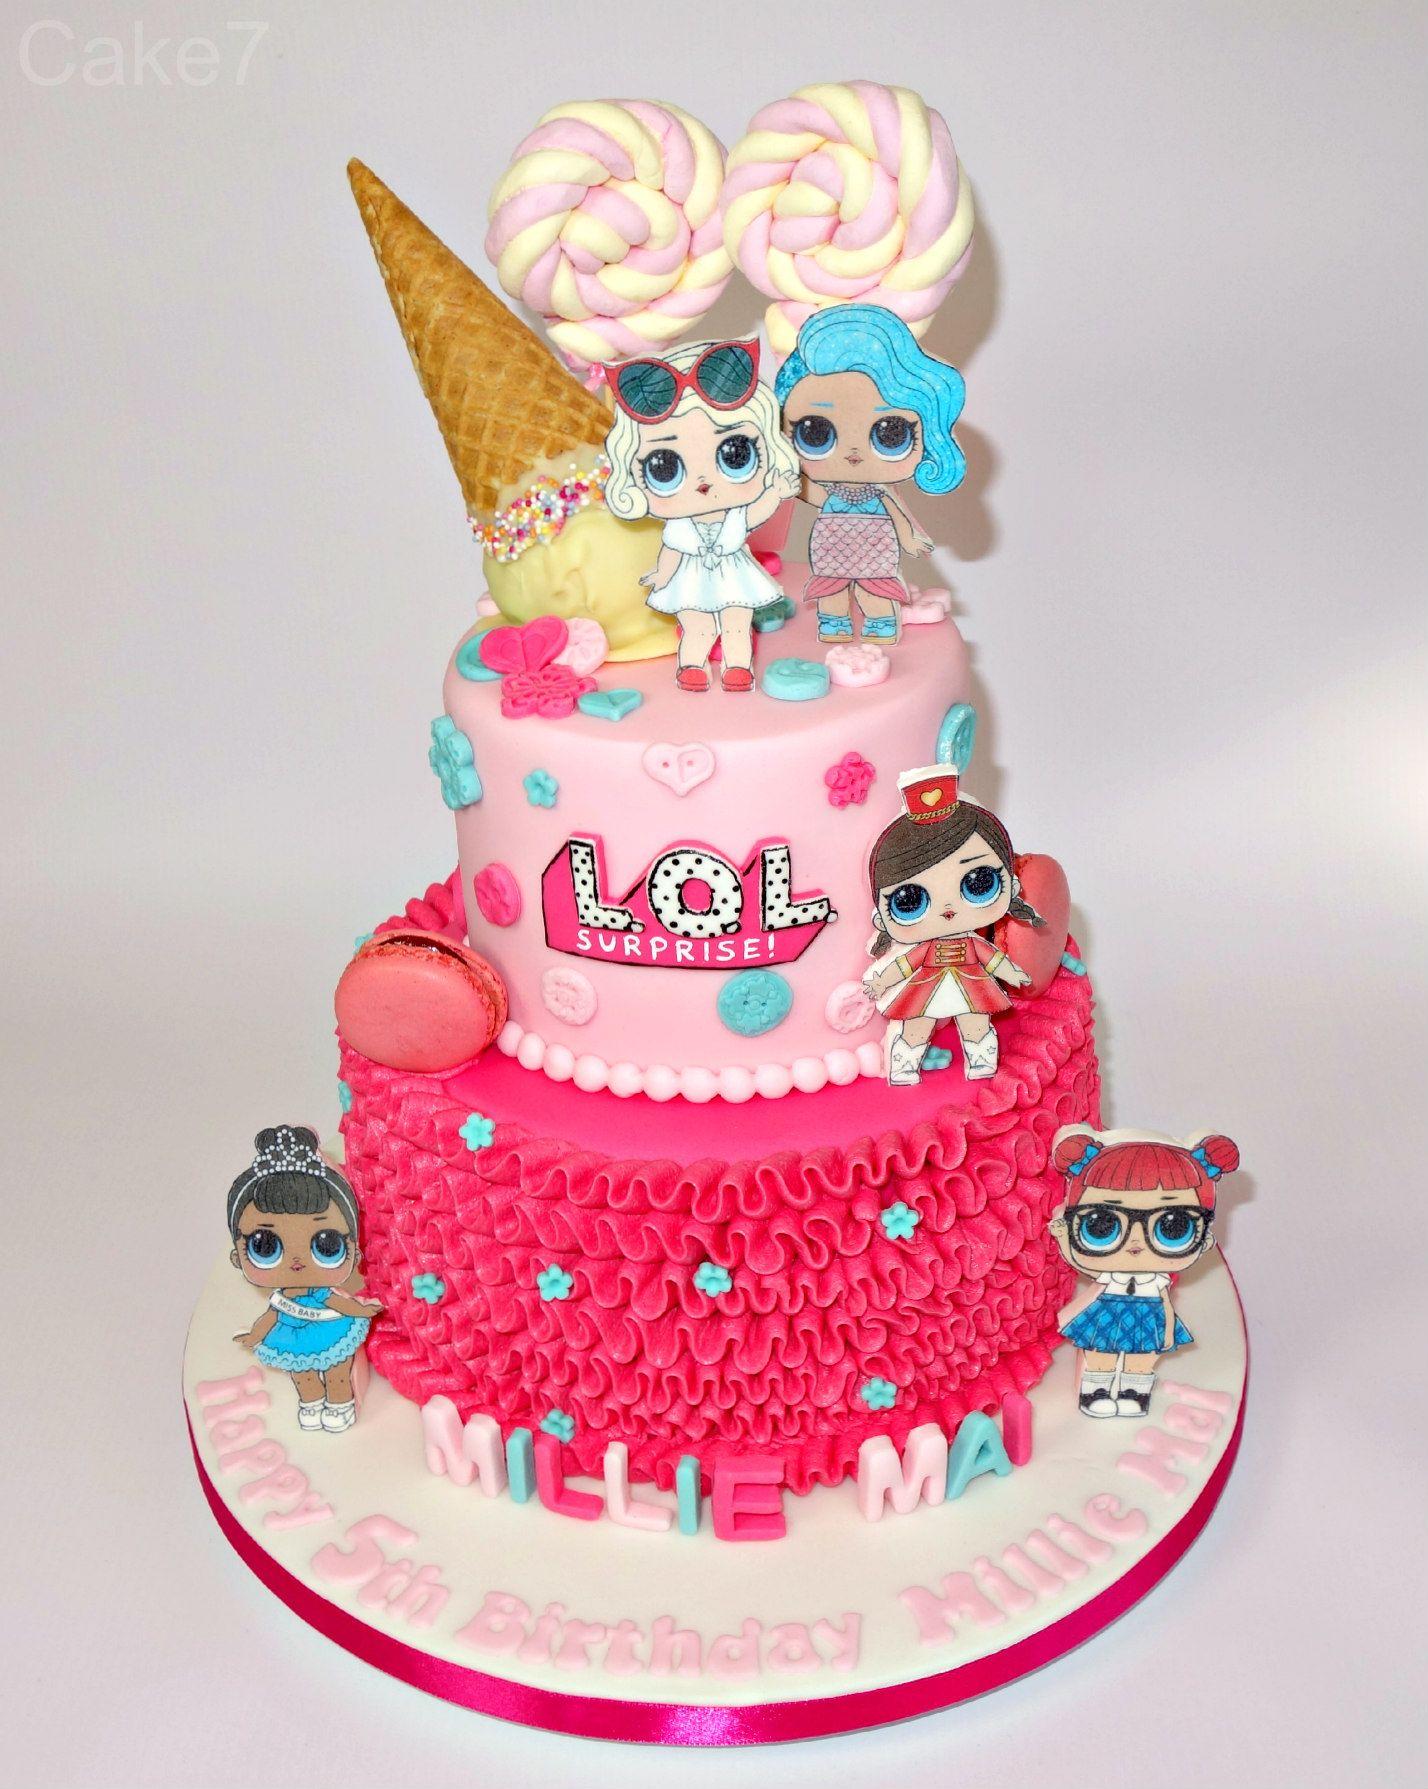 Lol Cake Www Cakeseven Wix Facebook Cake7 Twitter Cake7